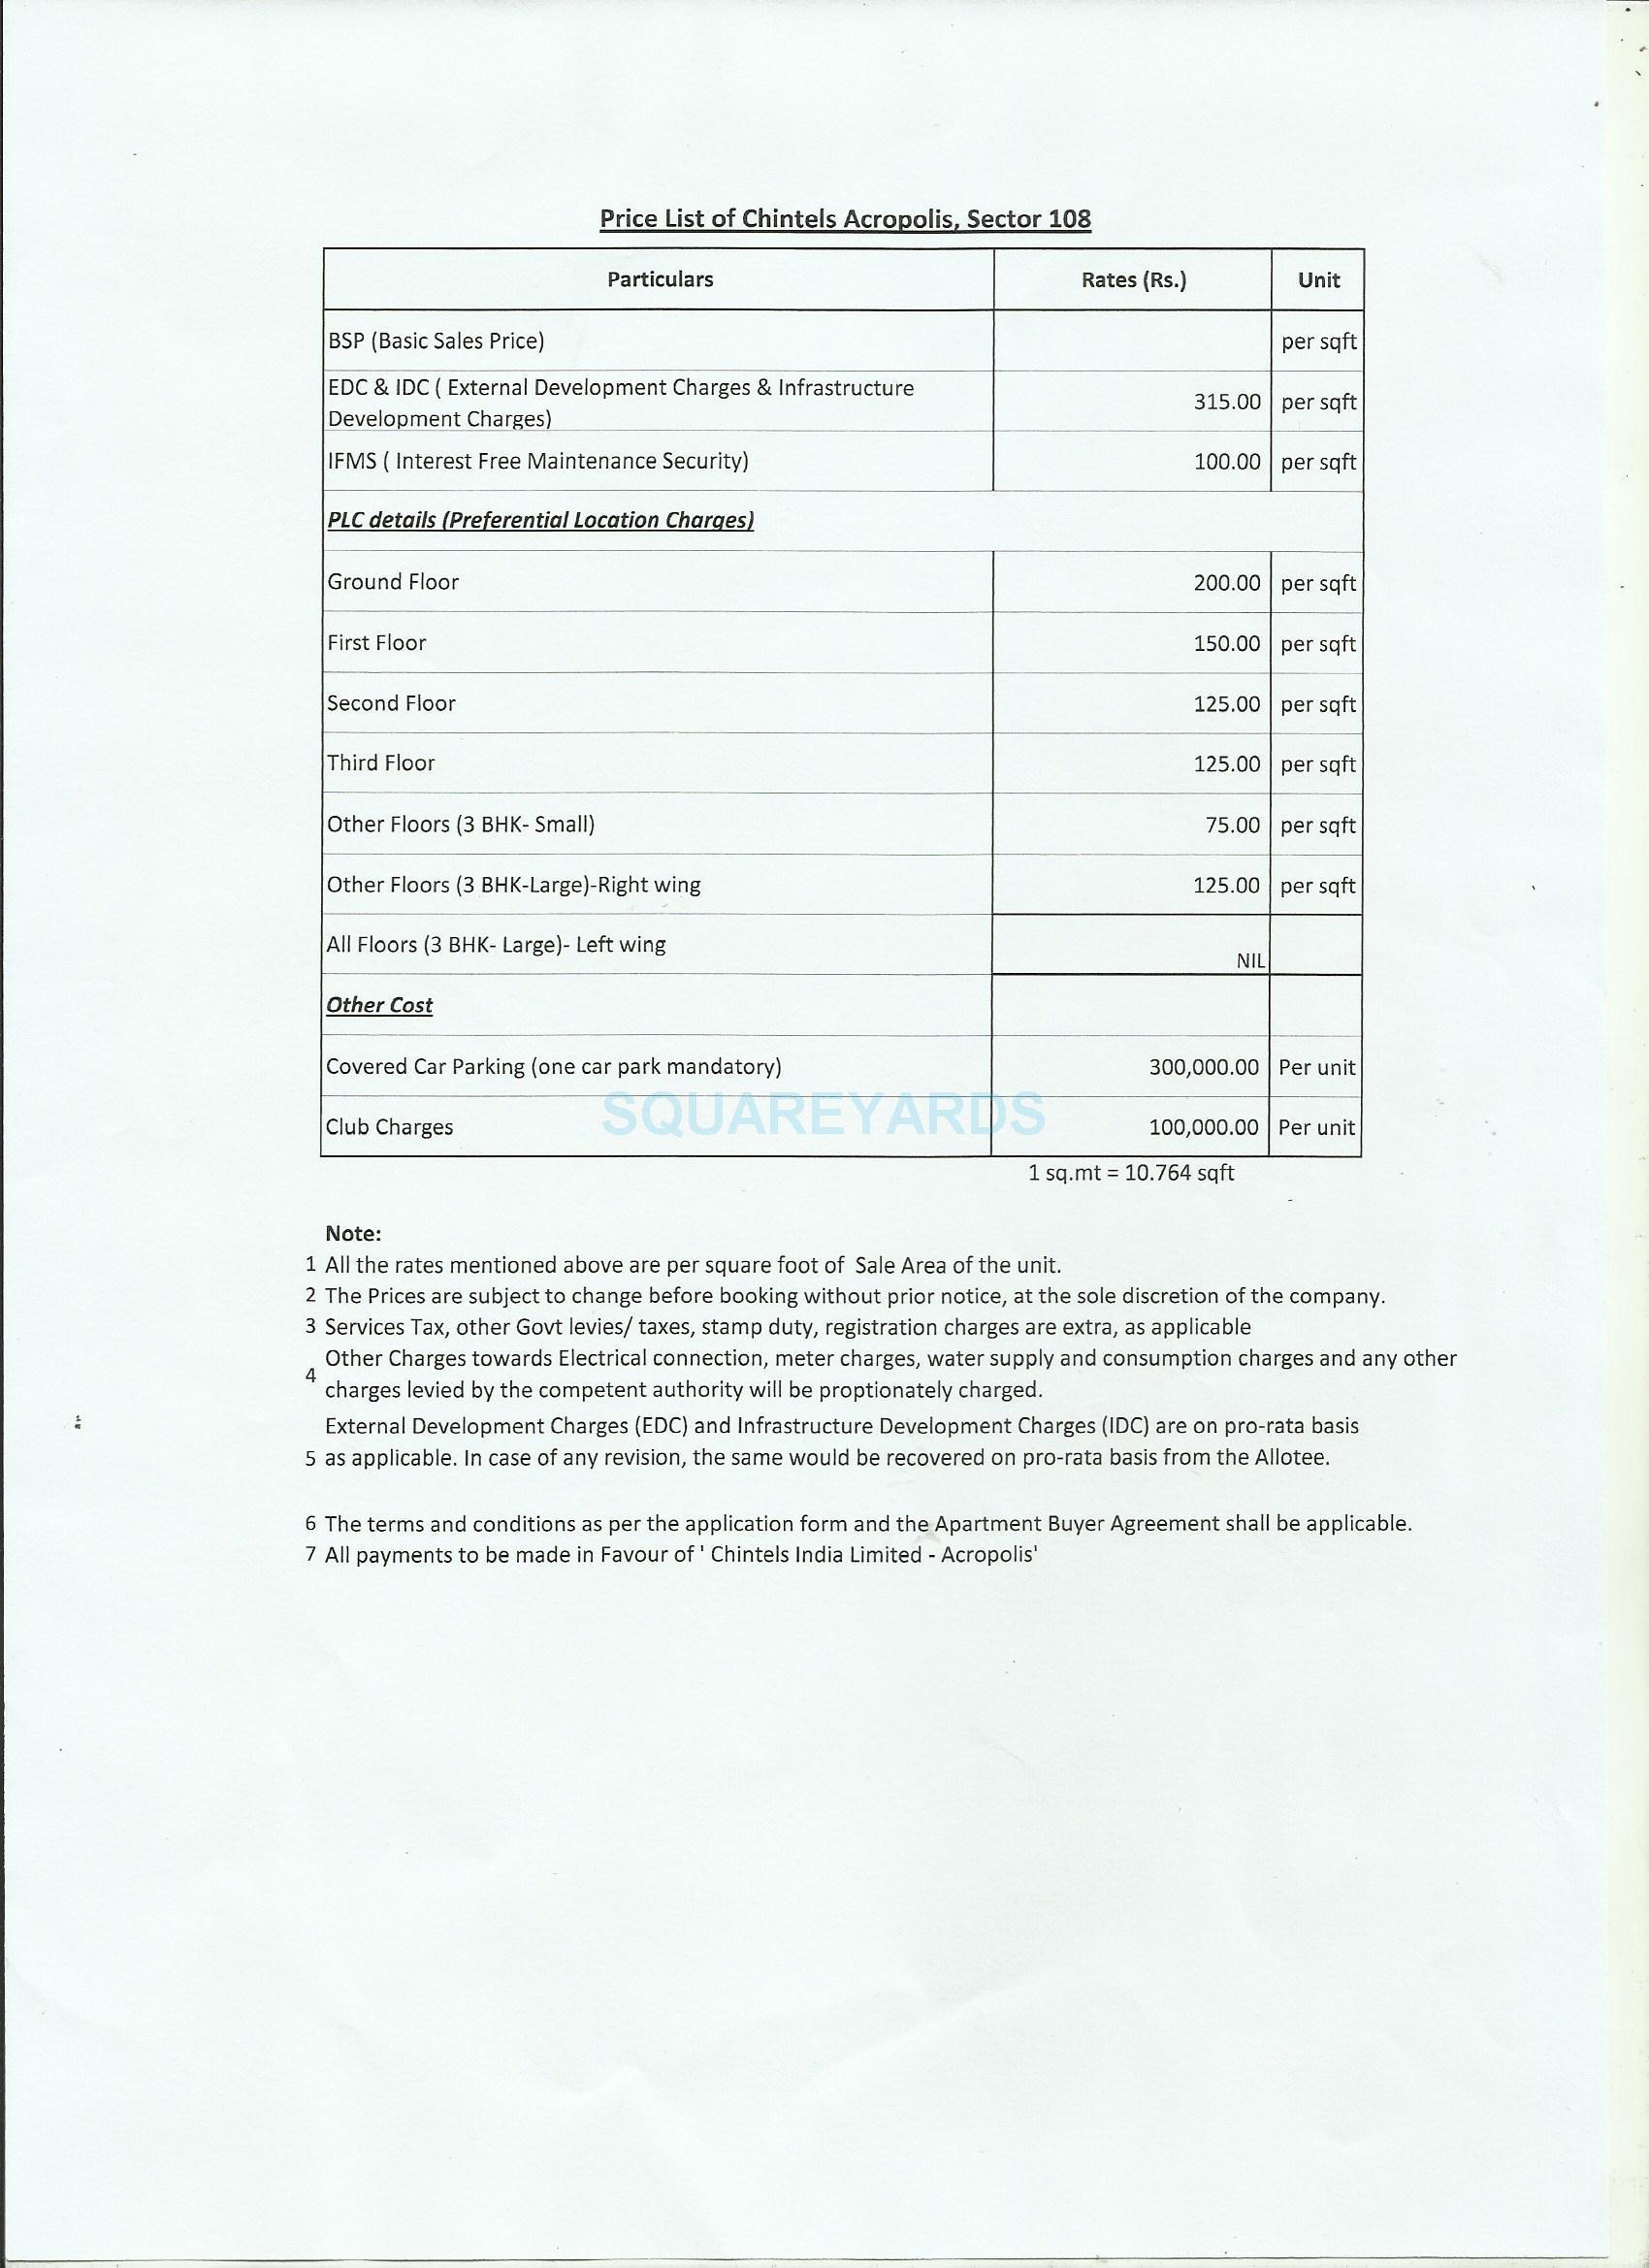 chintels acropolis payment plan image1